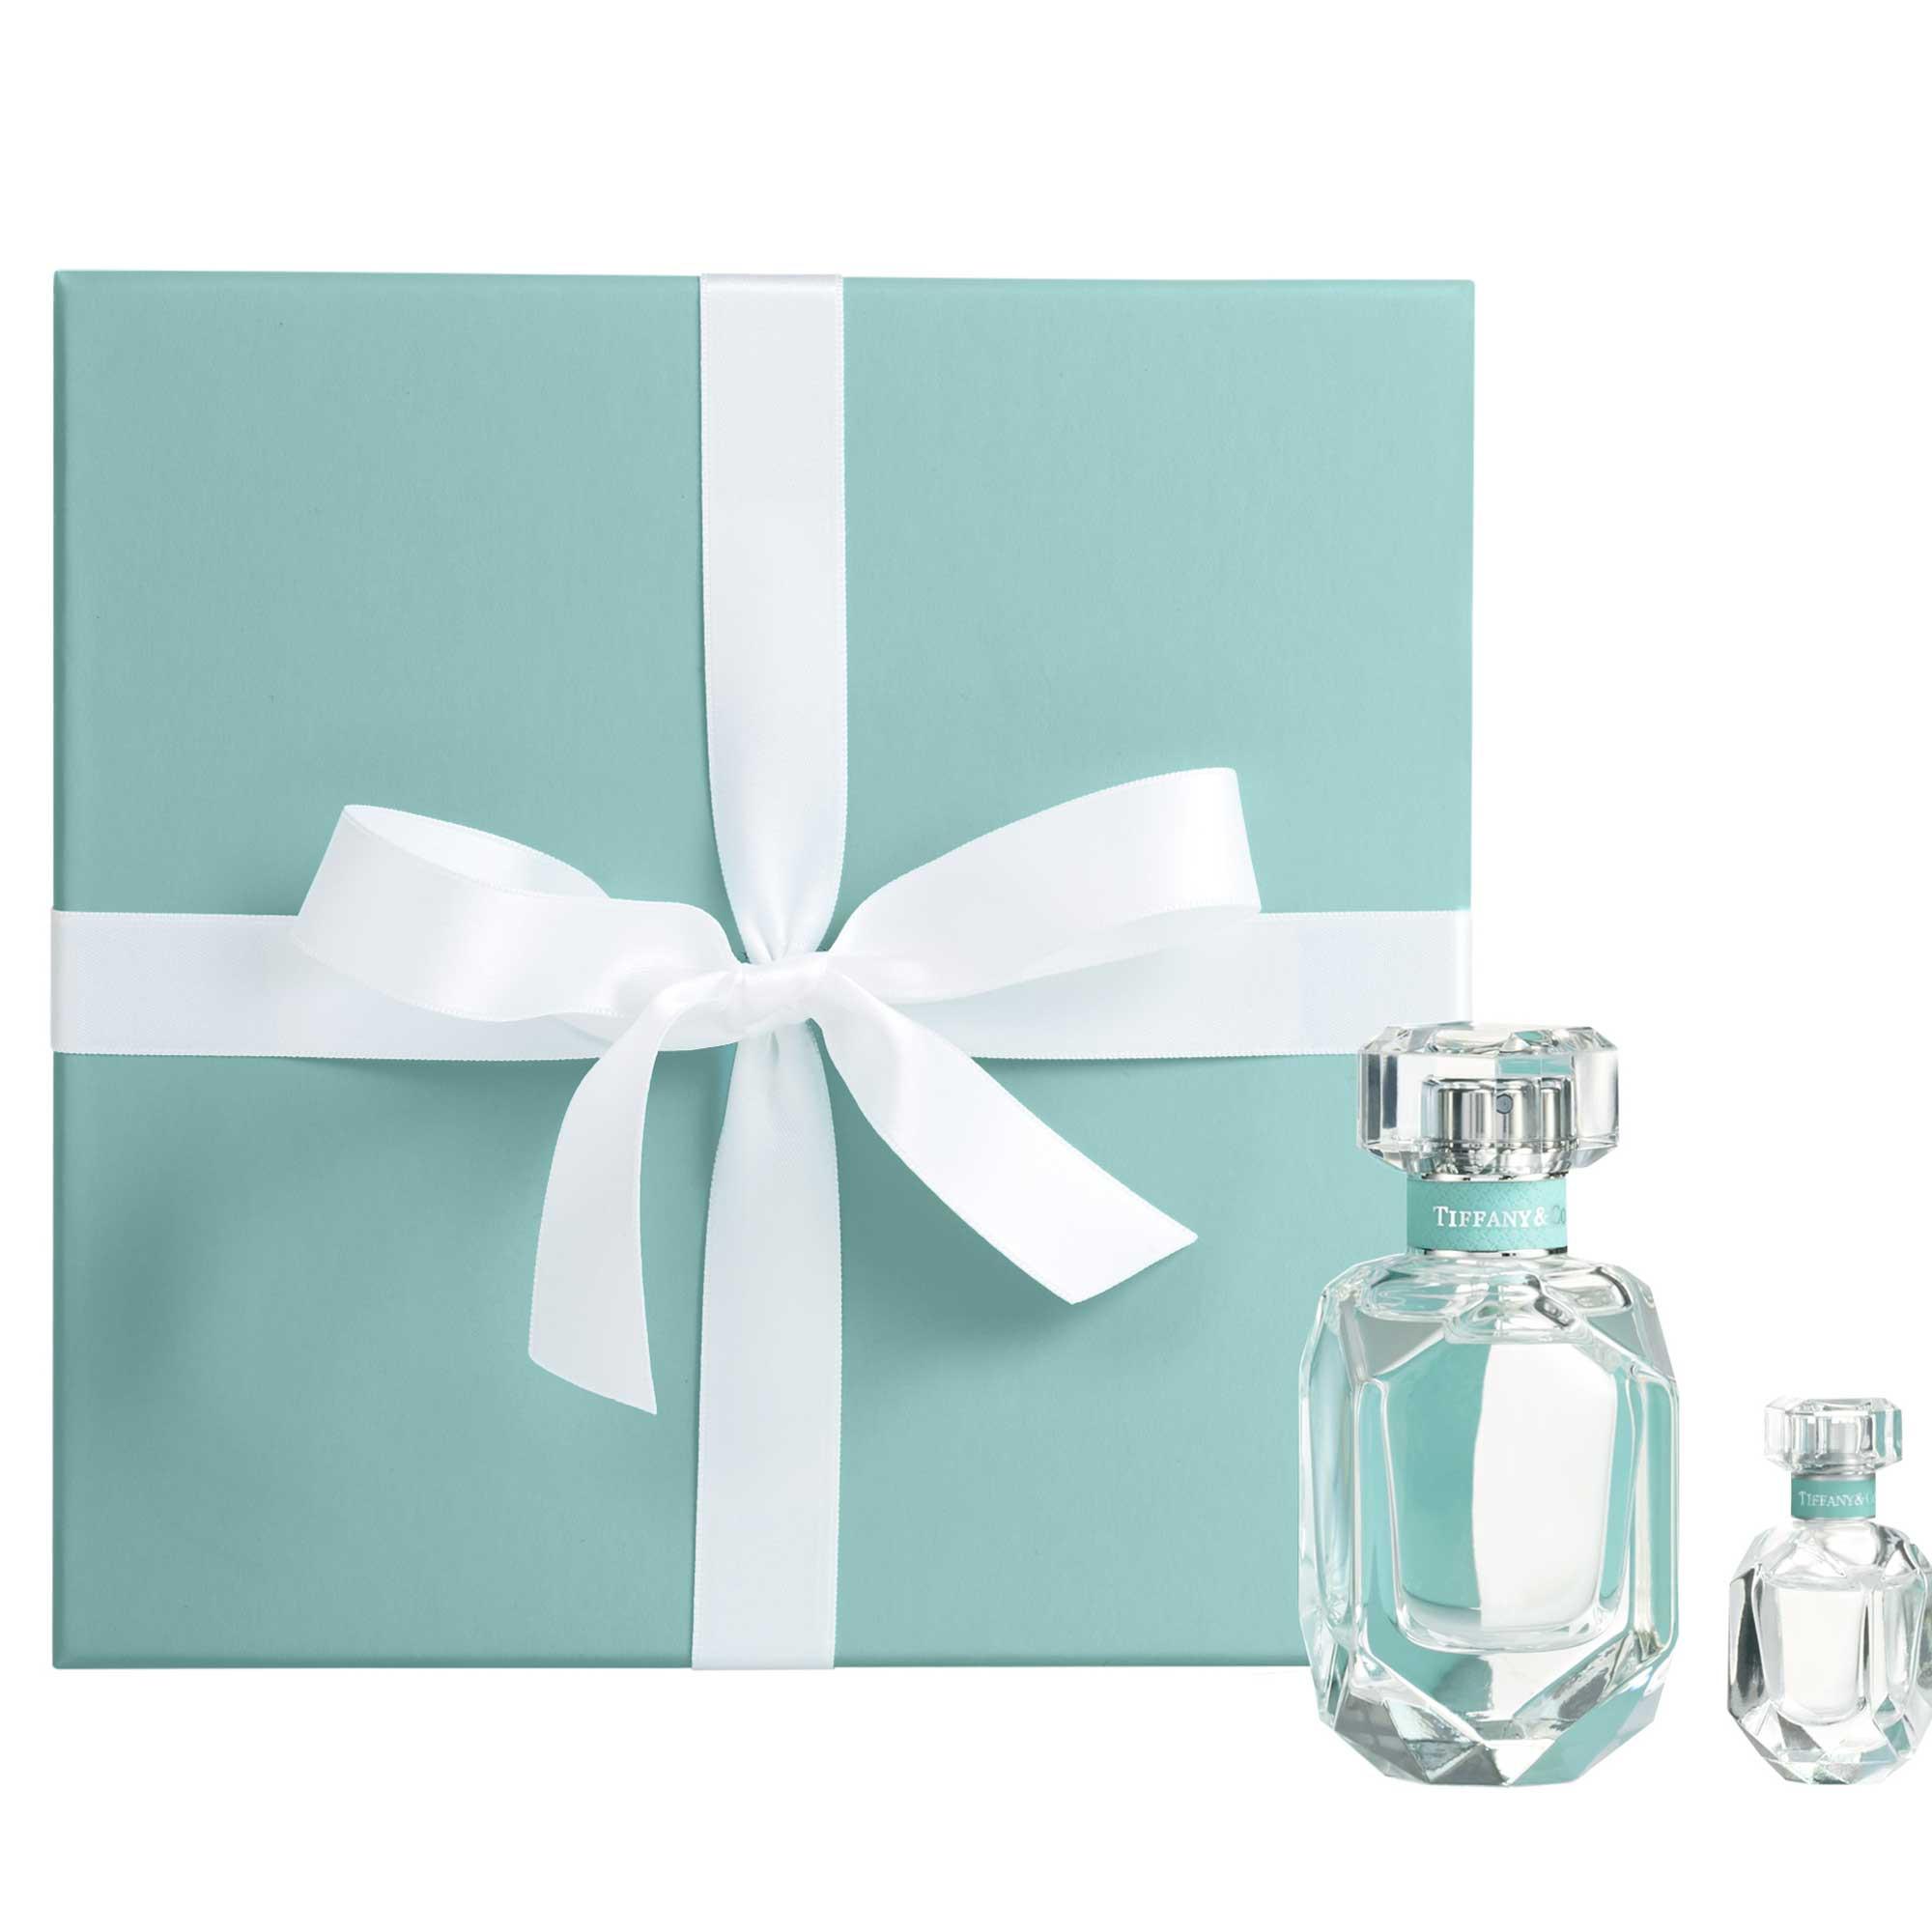 Tiffany Eau de Parfum  - Tiffany & Co.